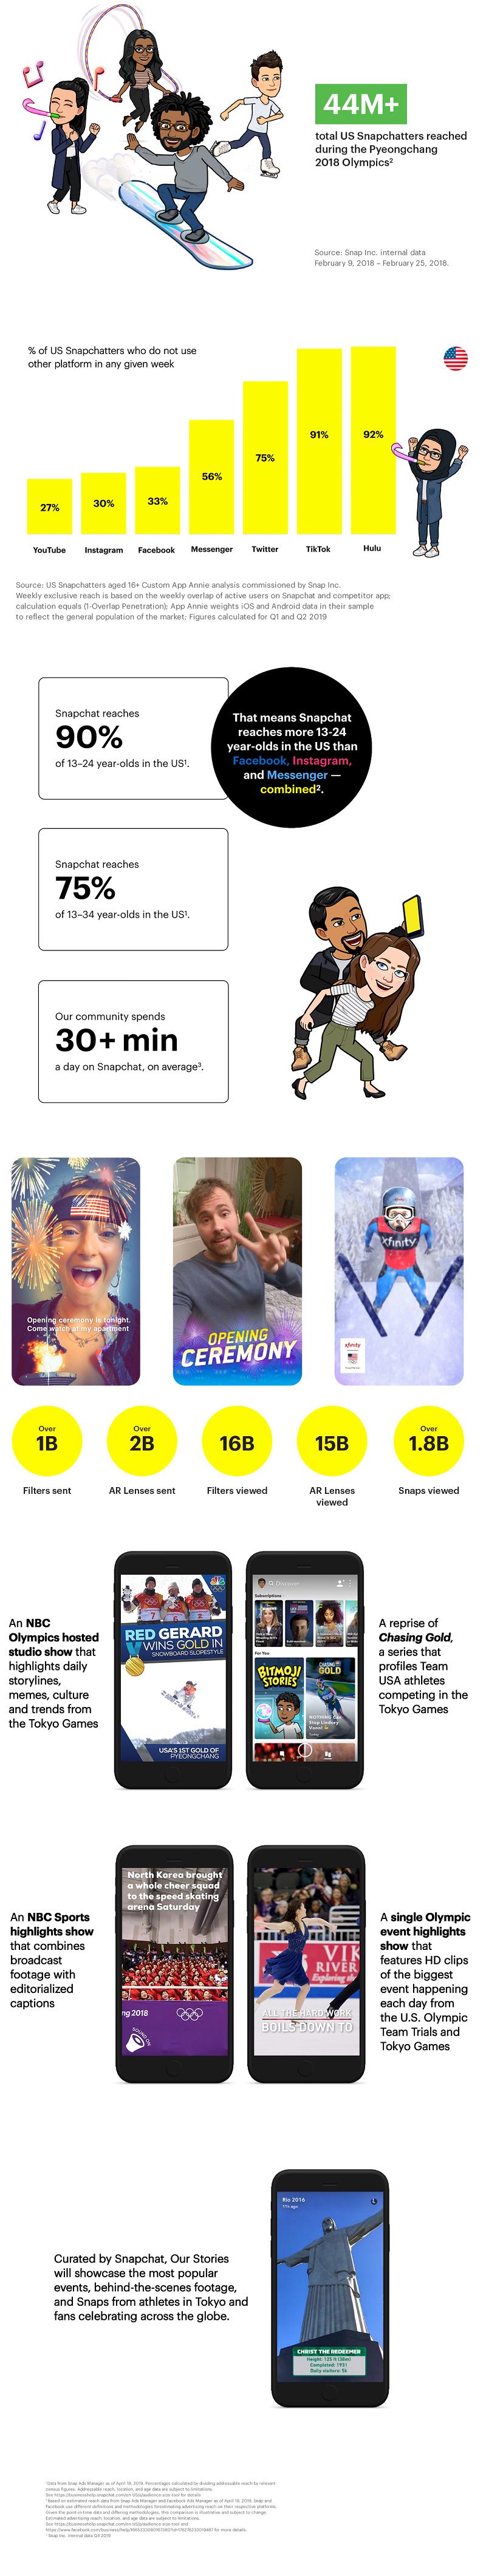 Snapchat Olympics usage